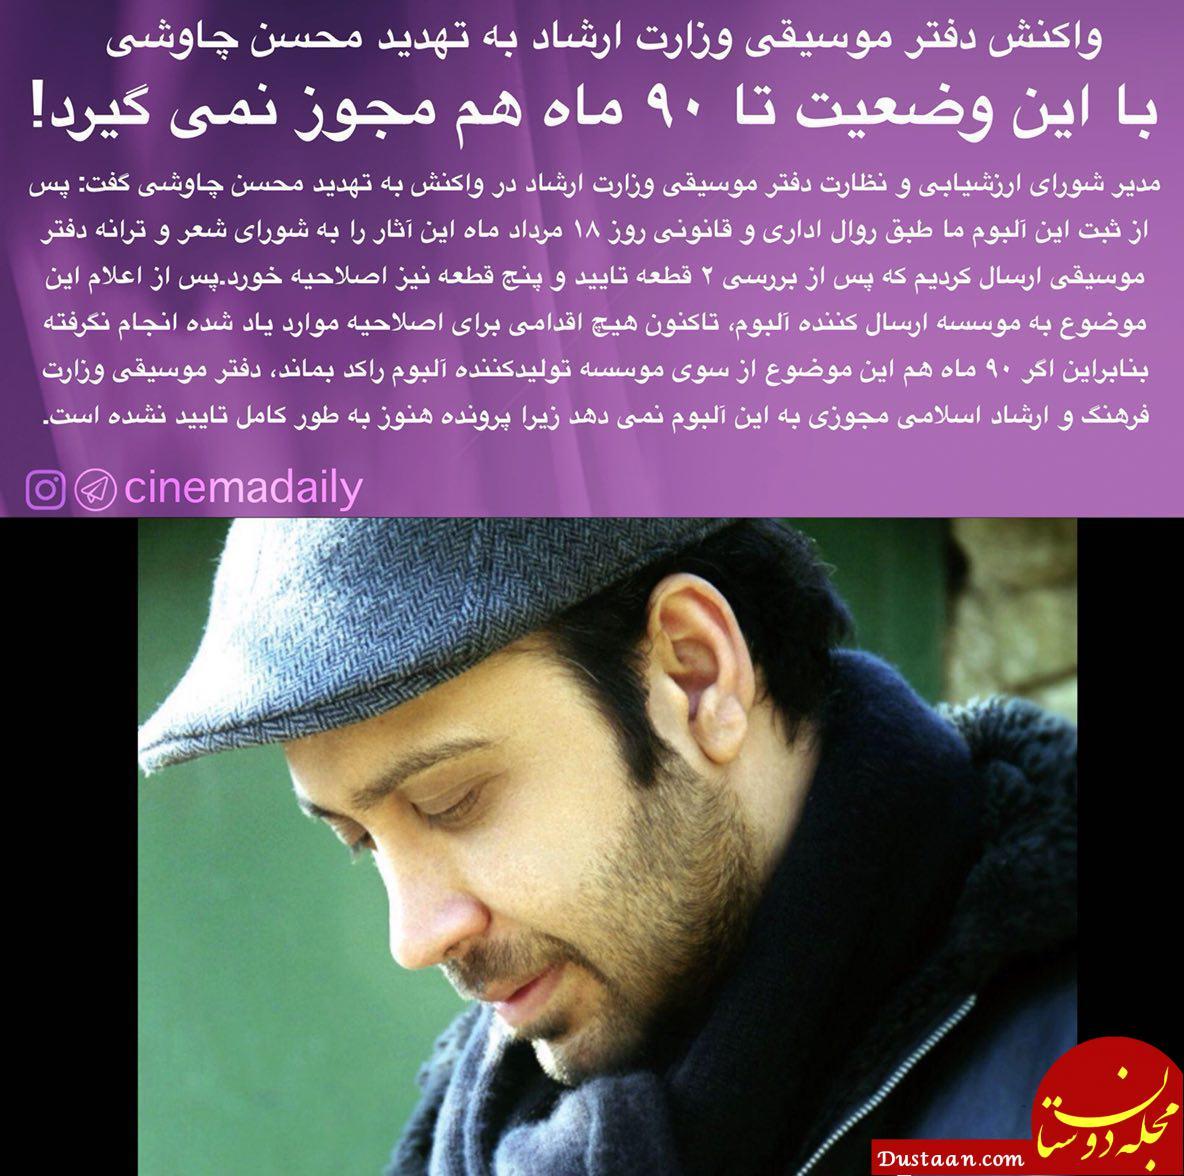 www.dustaan.com آلبوم چاوشی با این اوضاع تا 90 ماه هم مجوز نمی گیرد!